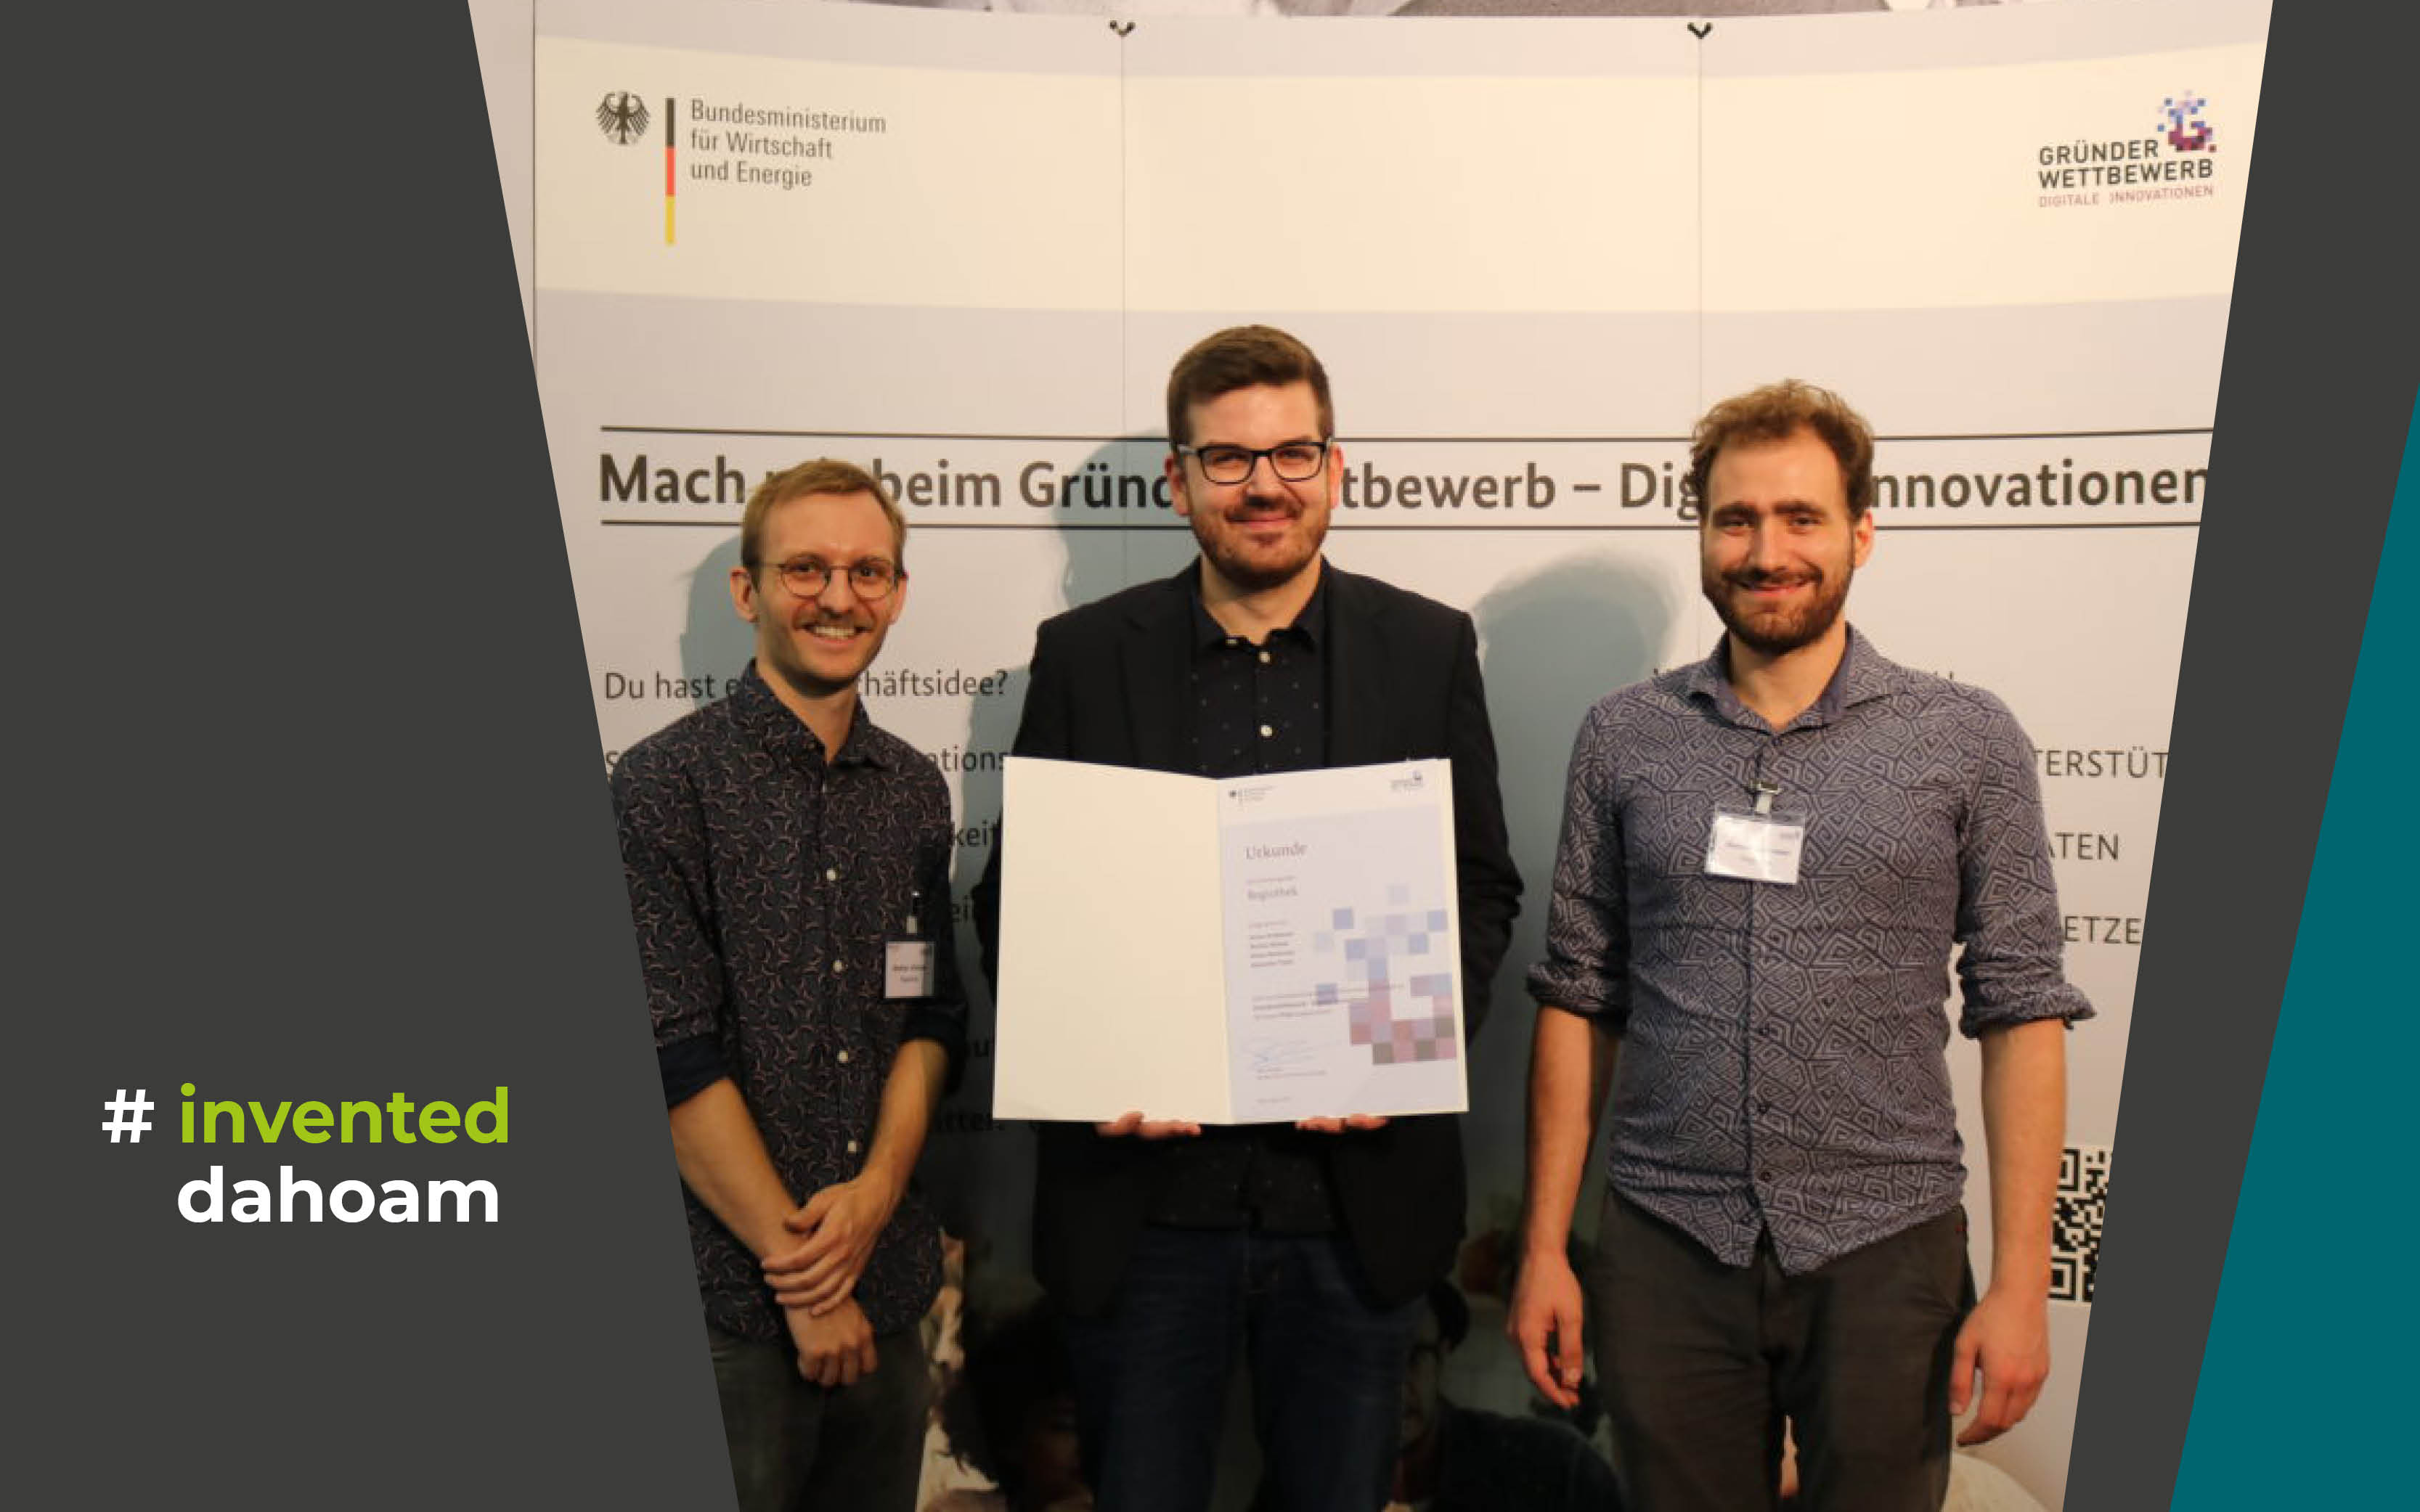 Regiothek ist Preisträger bei Digitale Innovationen